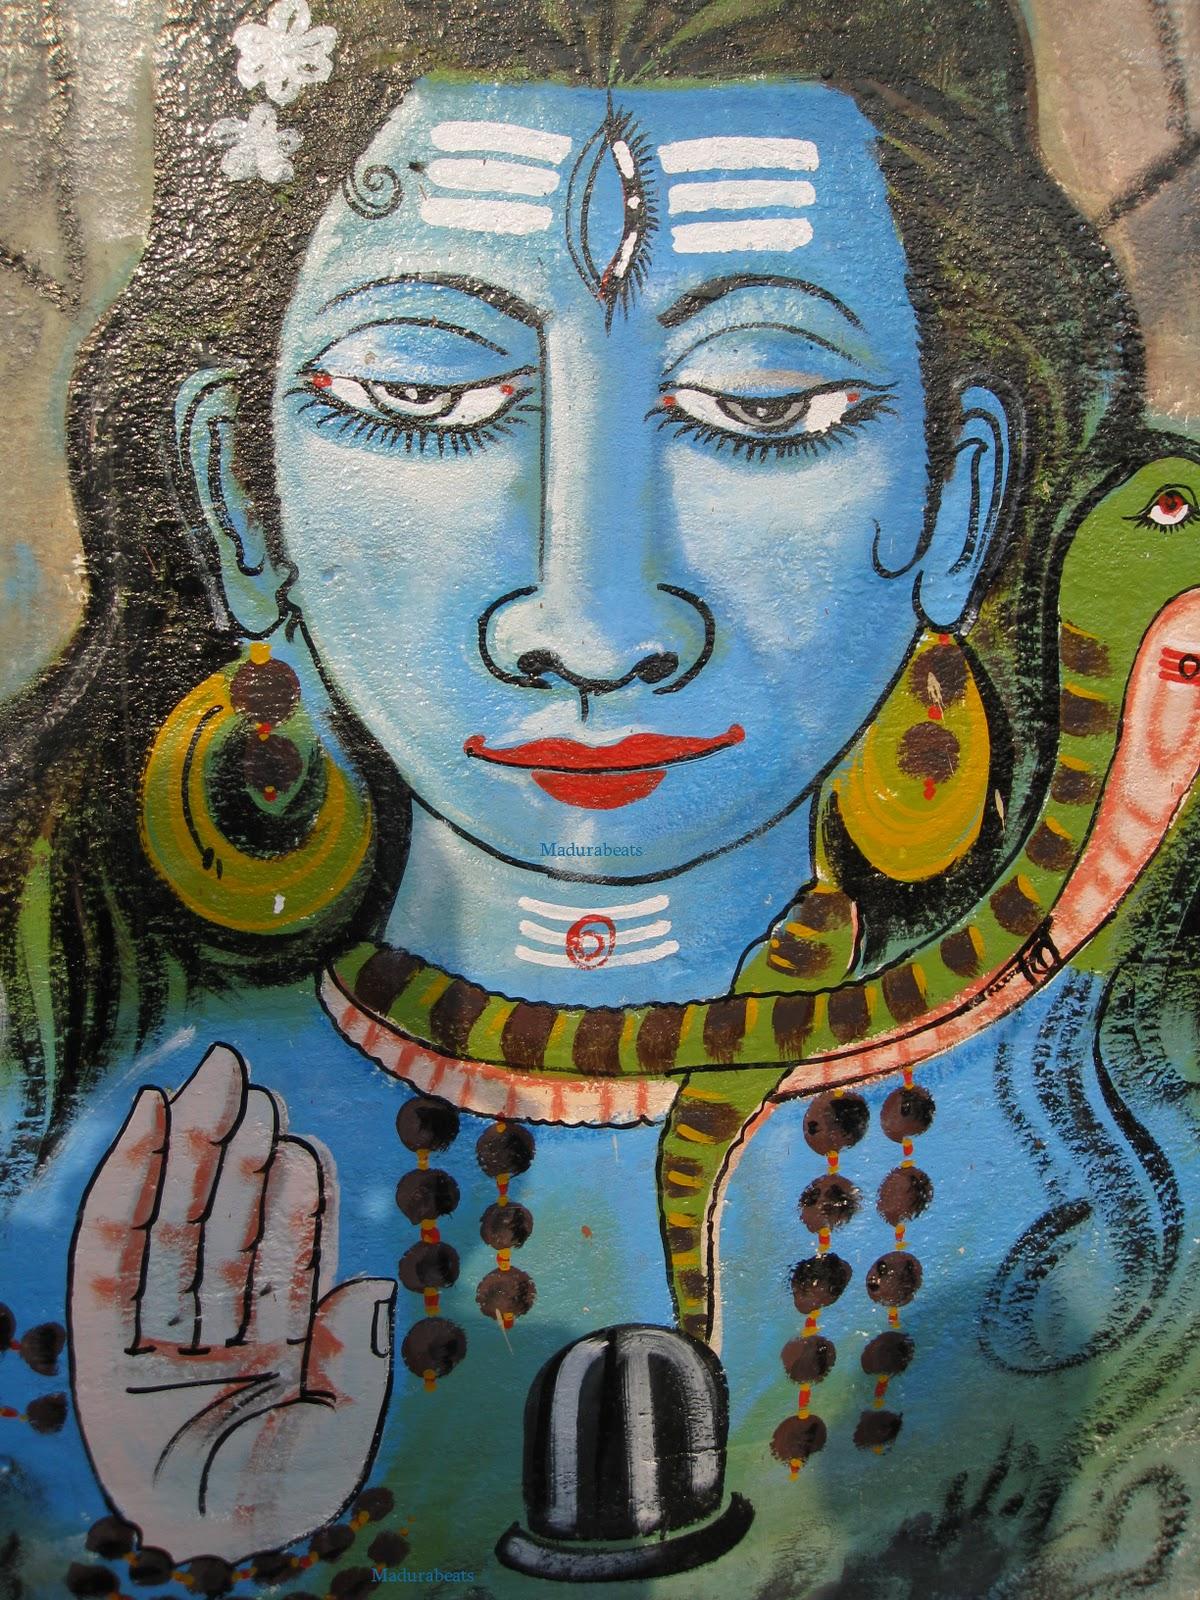 http://3.bp.blogspot.com/_z4BcYVnVAso/TP4mjf7vicI/AAAAAAAAAtA/mi0nJSZqnCs/s1600/lord-Shiva-painting.jpg